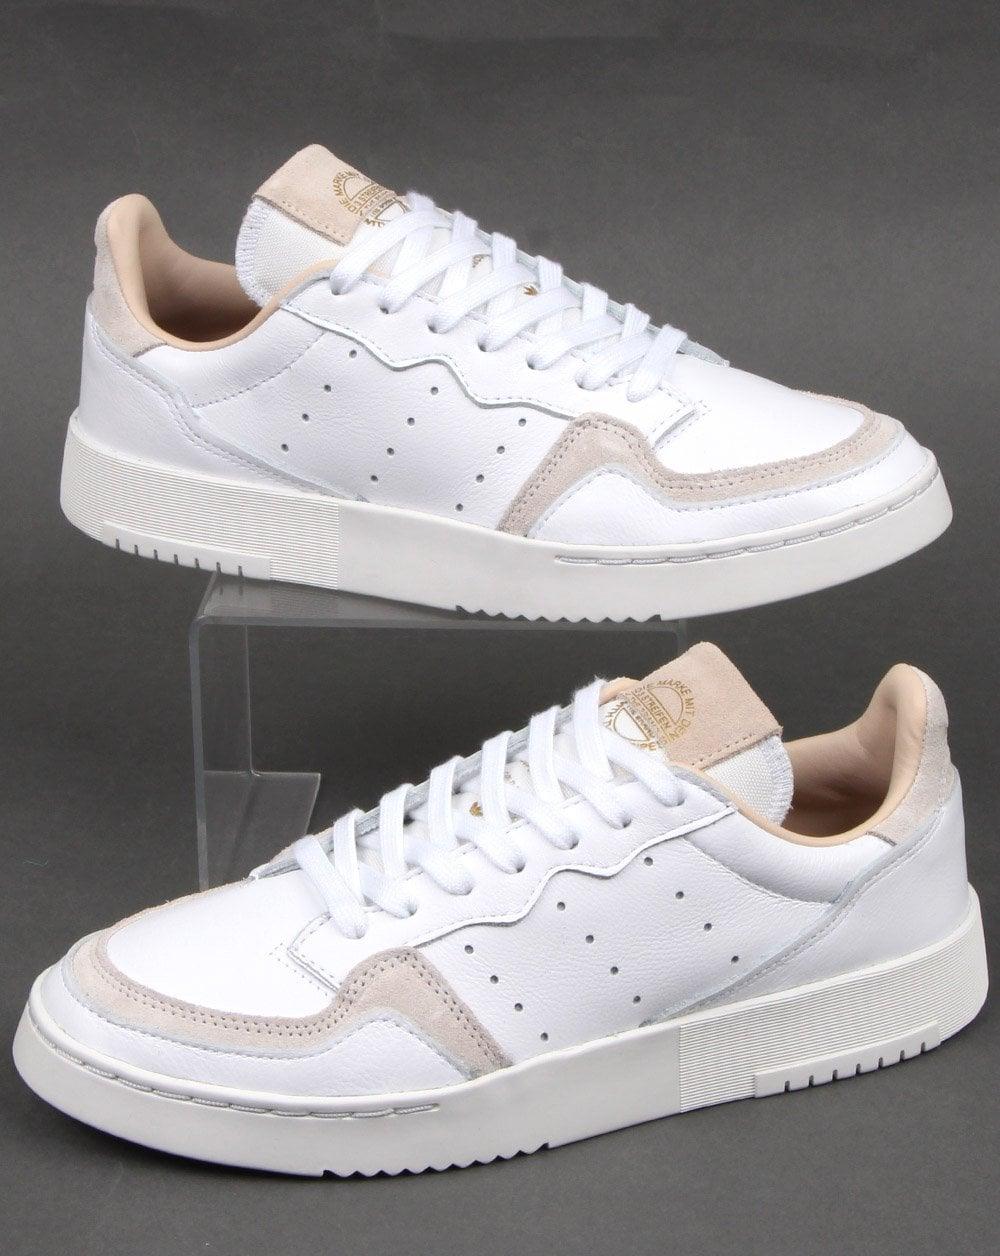 Adidas Supercourt Trainers White